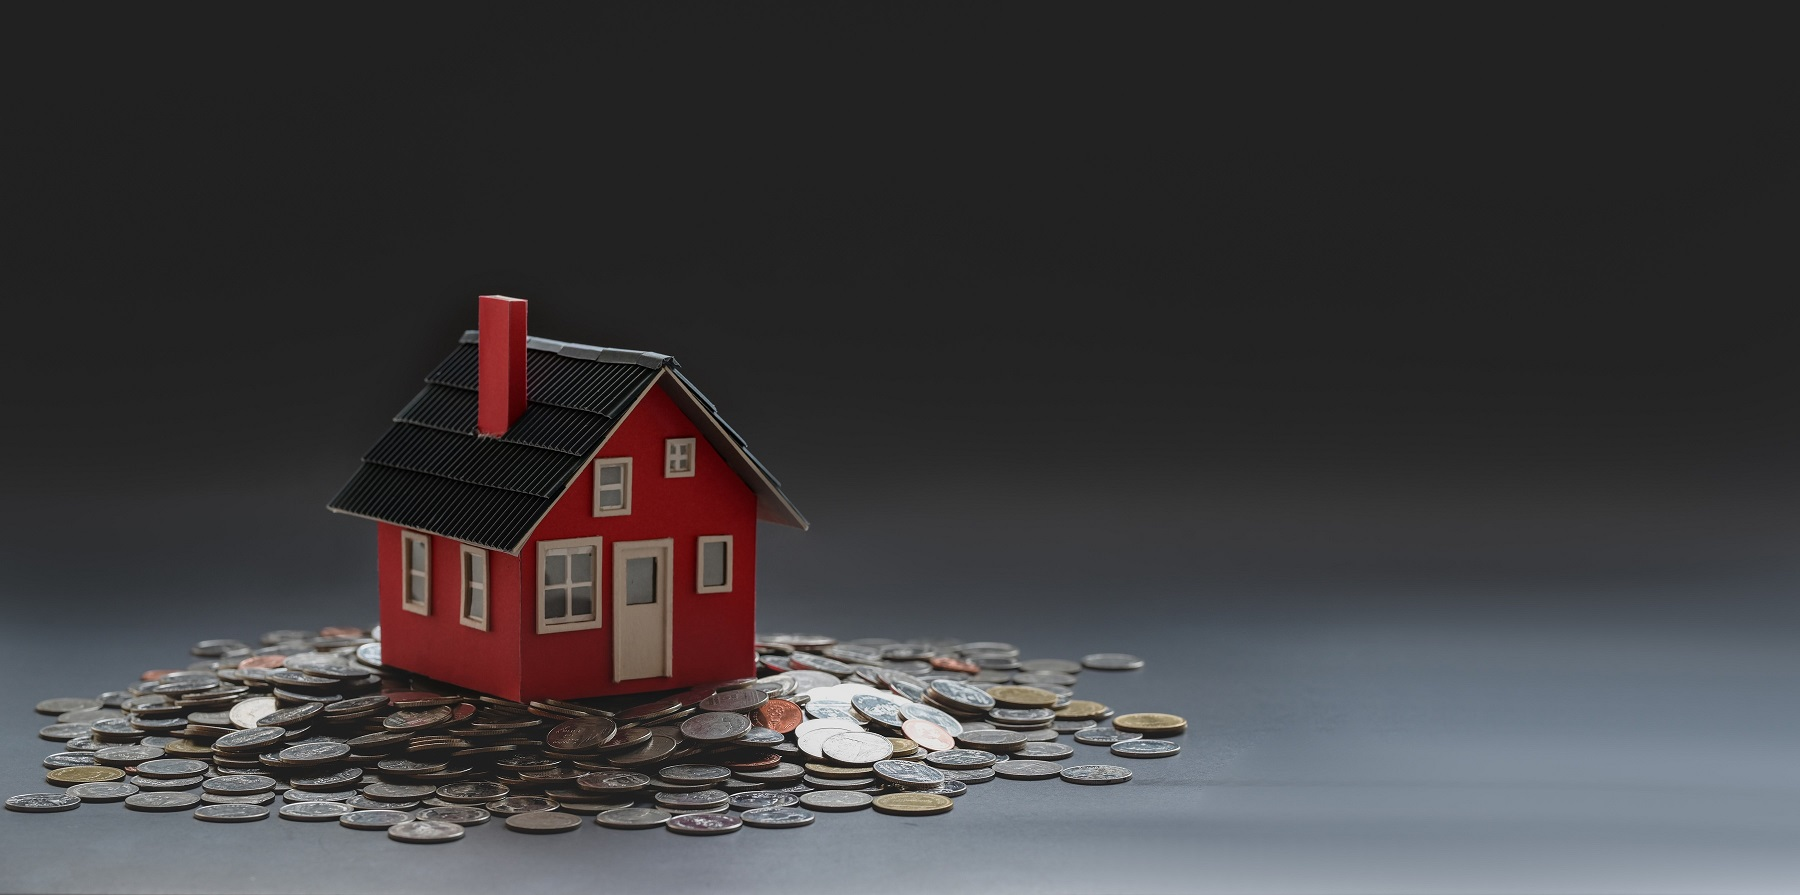 bydleni finance dum penize